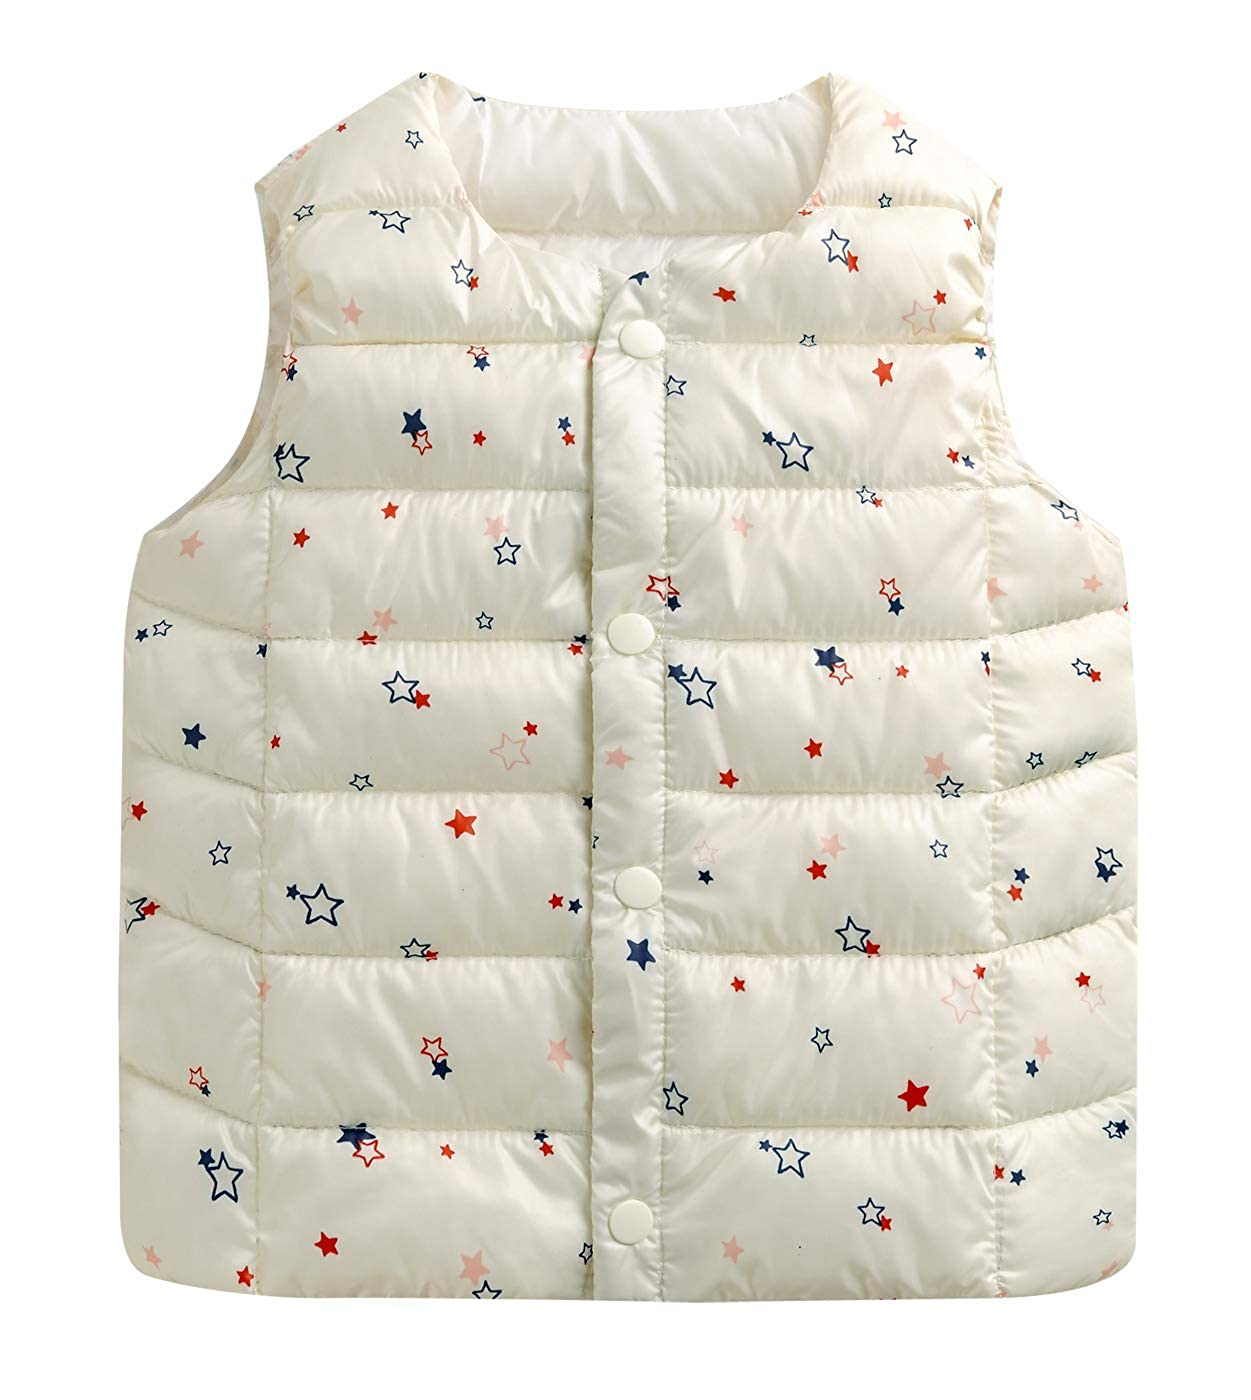 Happy Cherry Kids Boys Girls Toddlers Warm Down Jackets Autumn Winter Vest Tops Children Sleeveless Coat Gilets Outerwear